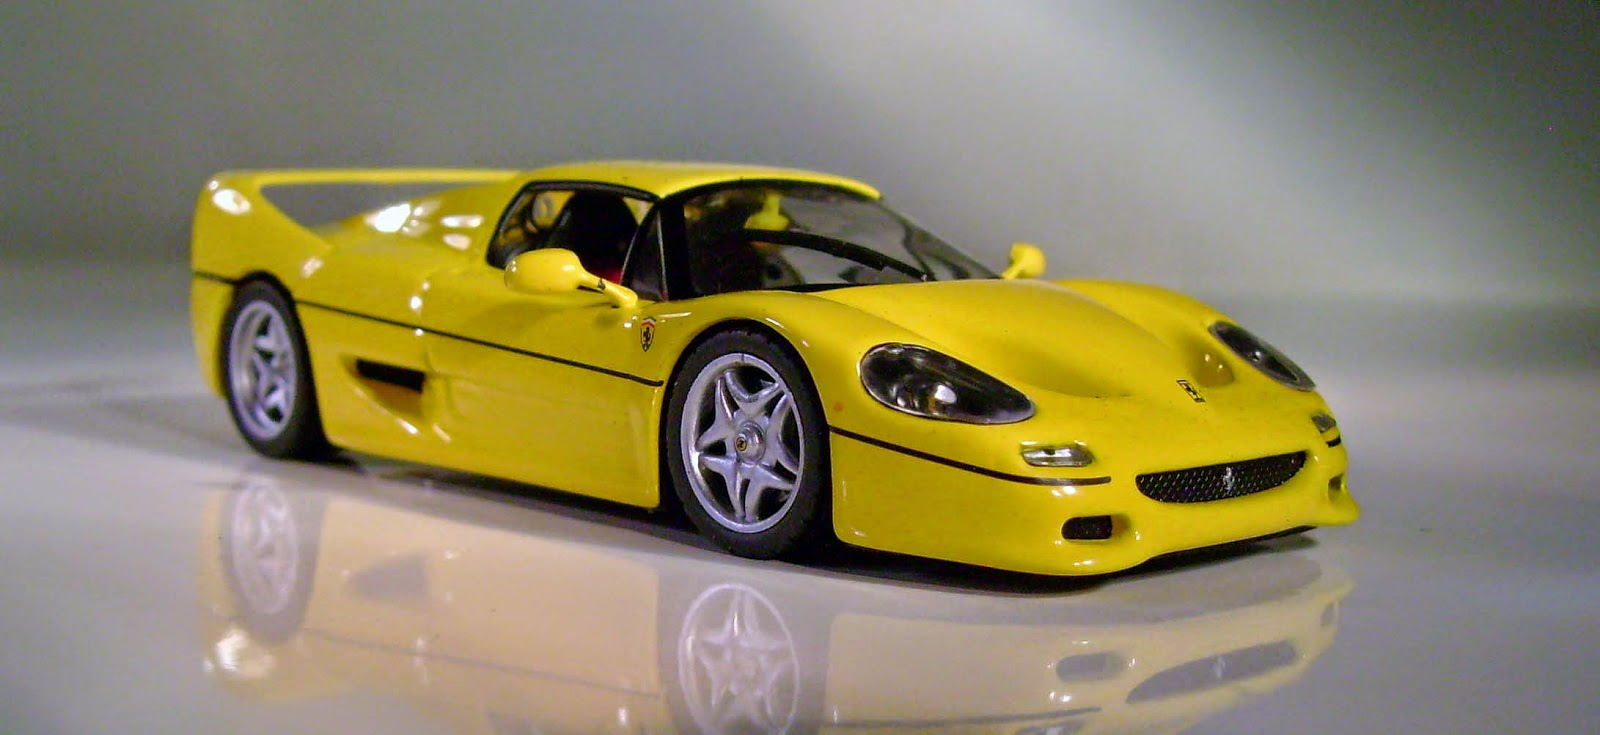 Colección coches de Rally a escala - Los más grandes coches de rallye F5095DSC01896EDCUT